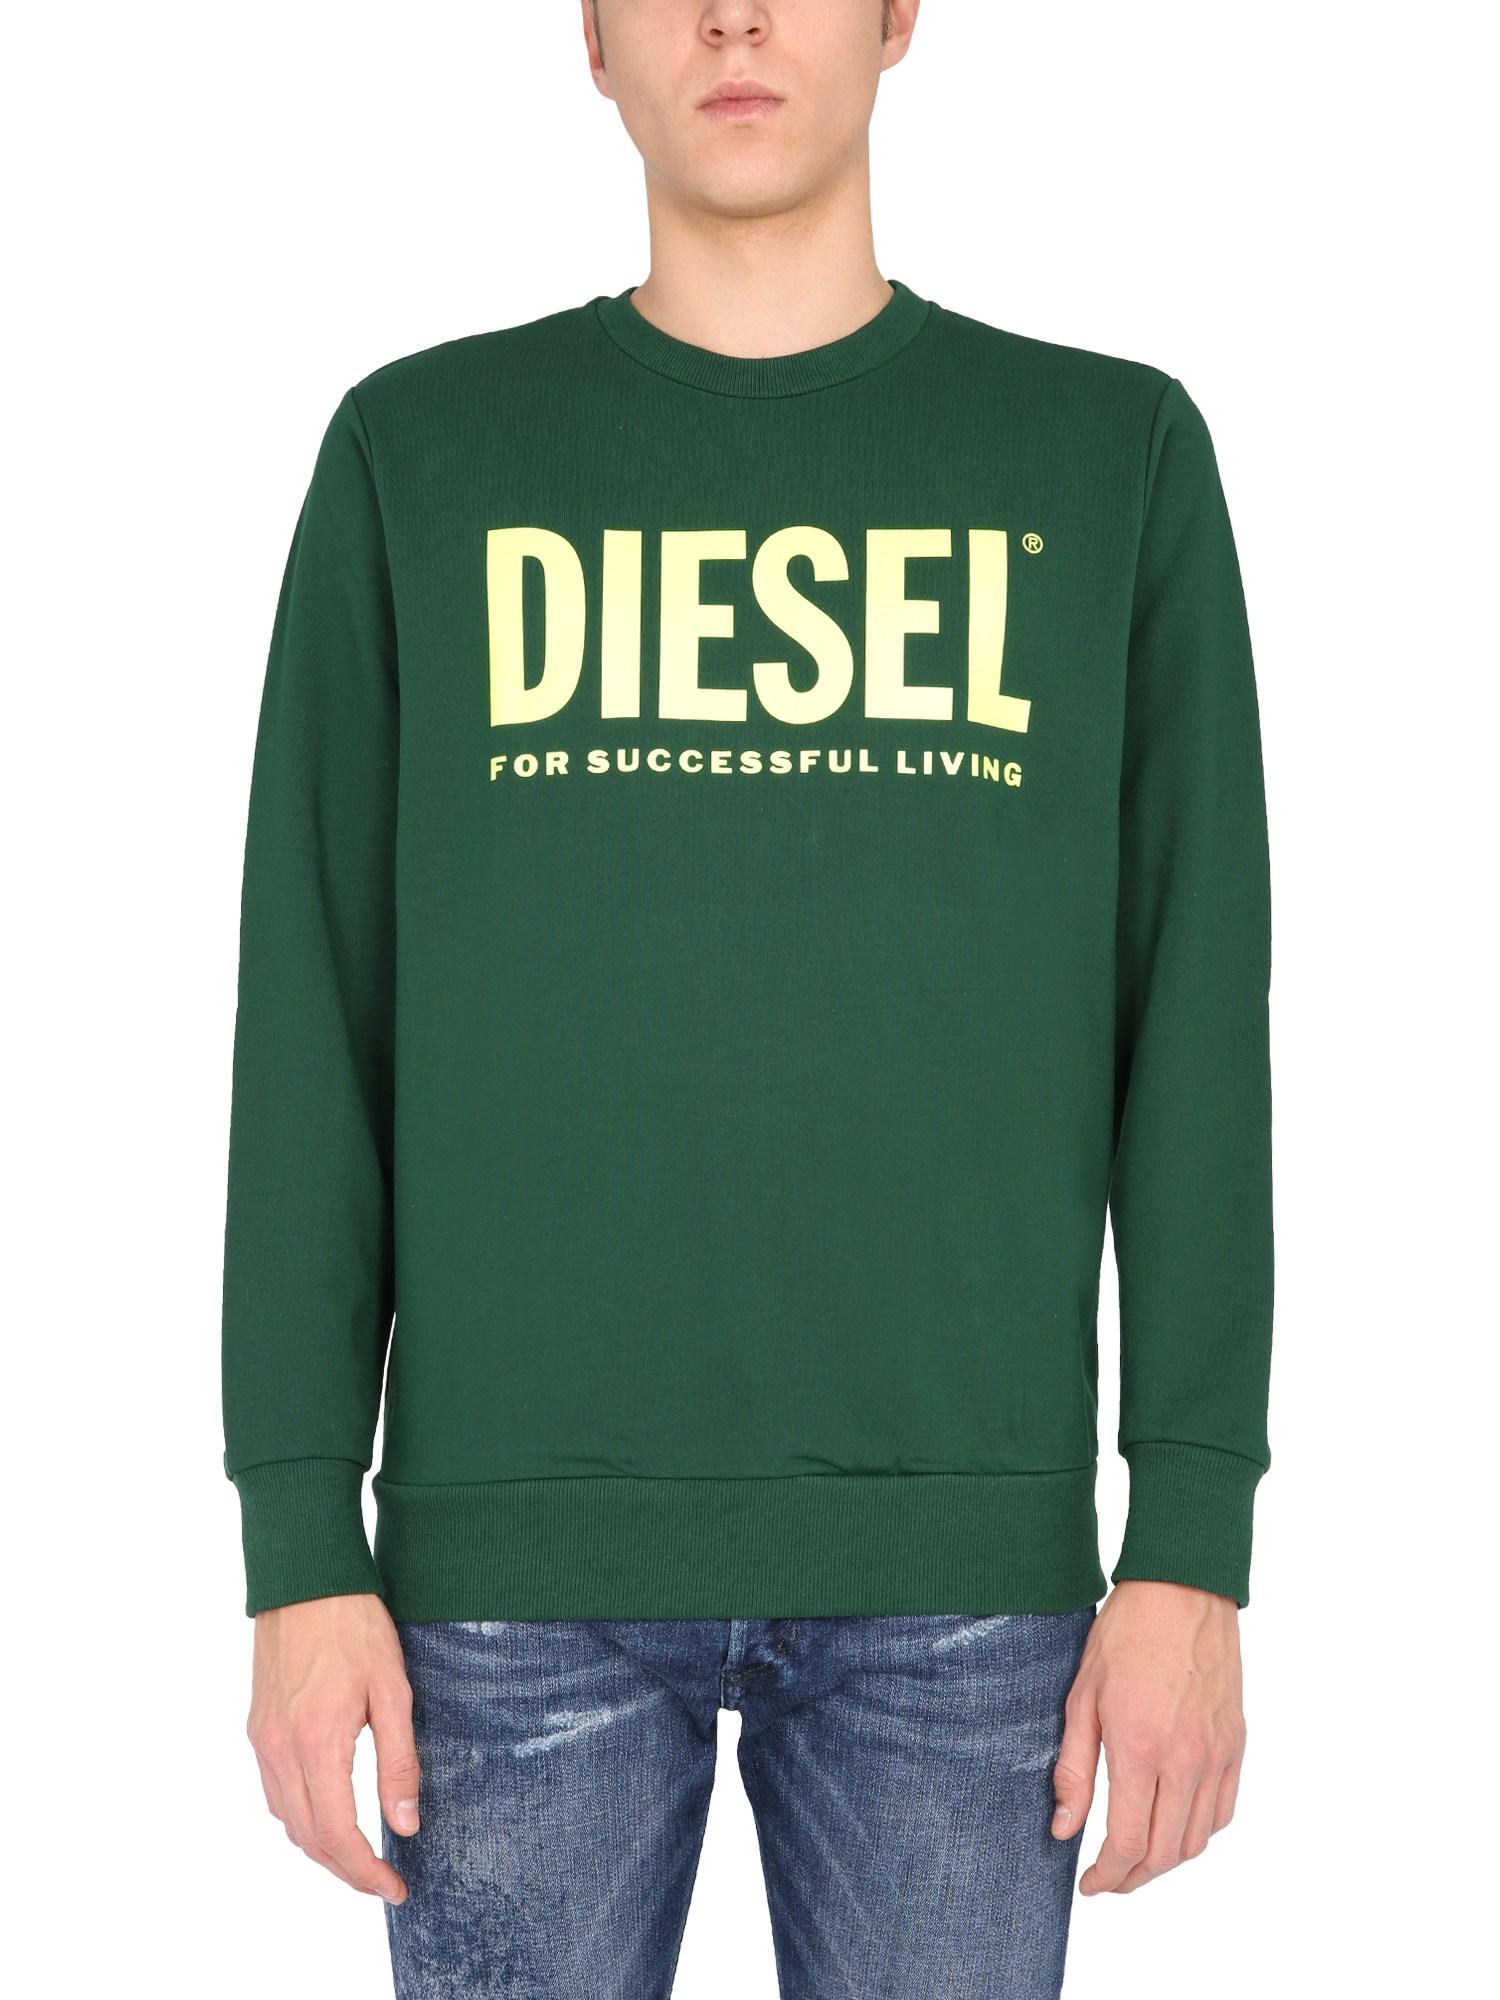 Diesel Clothing FELPA GIROCOLLO